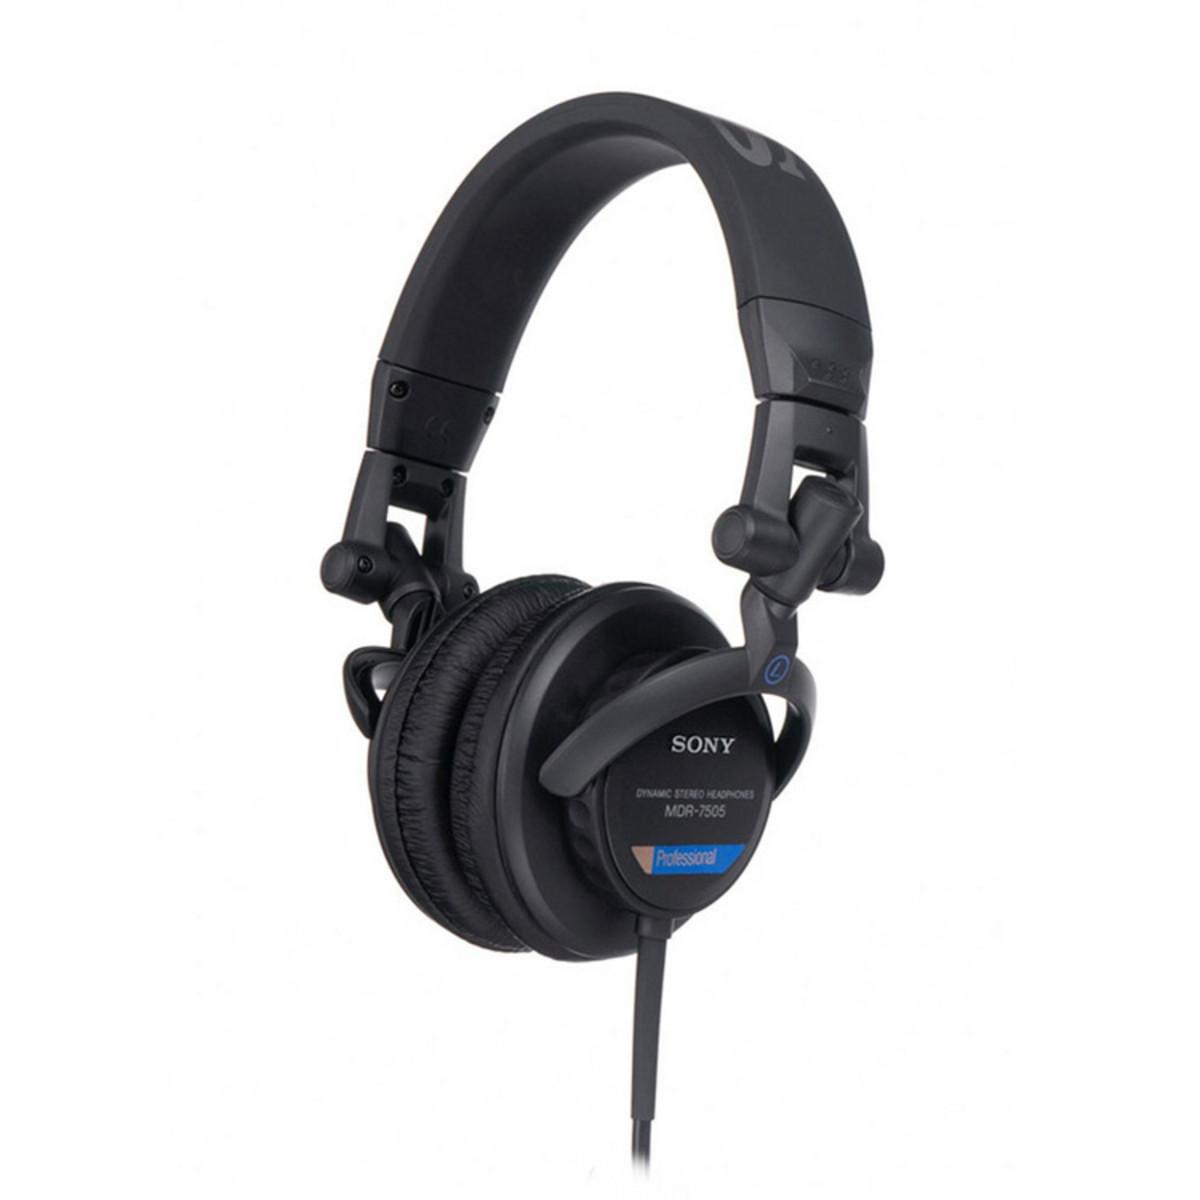 Sony MDR-7505 Stereo Headphones